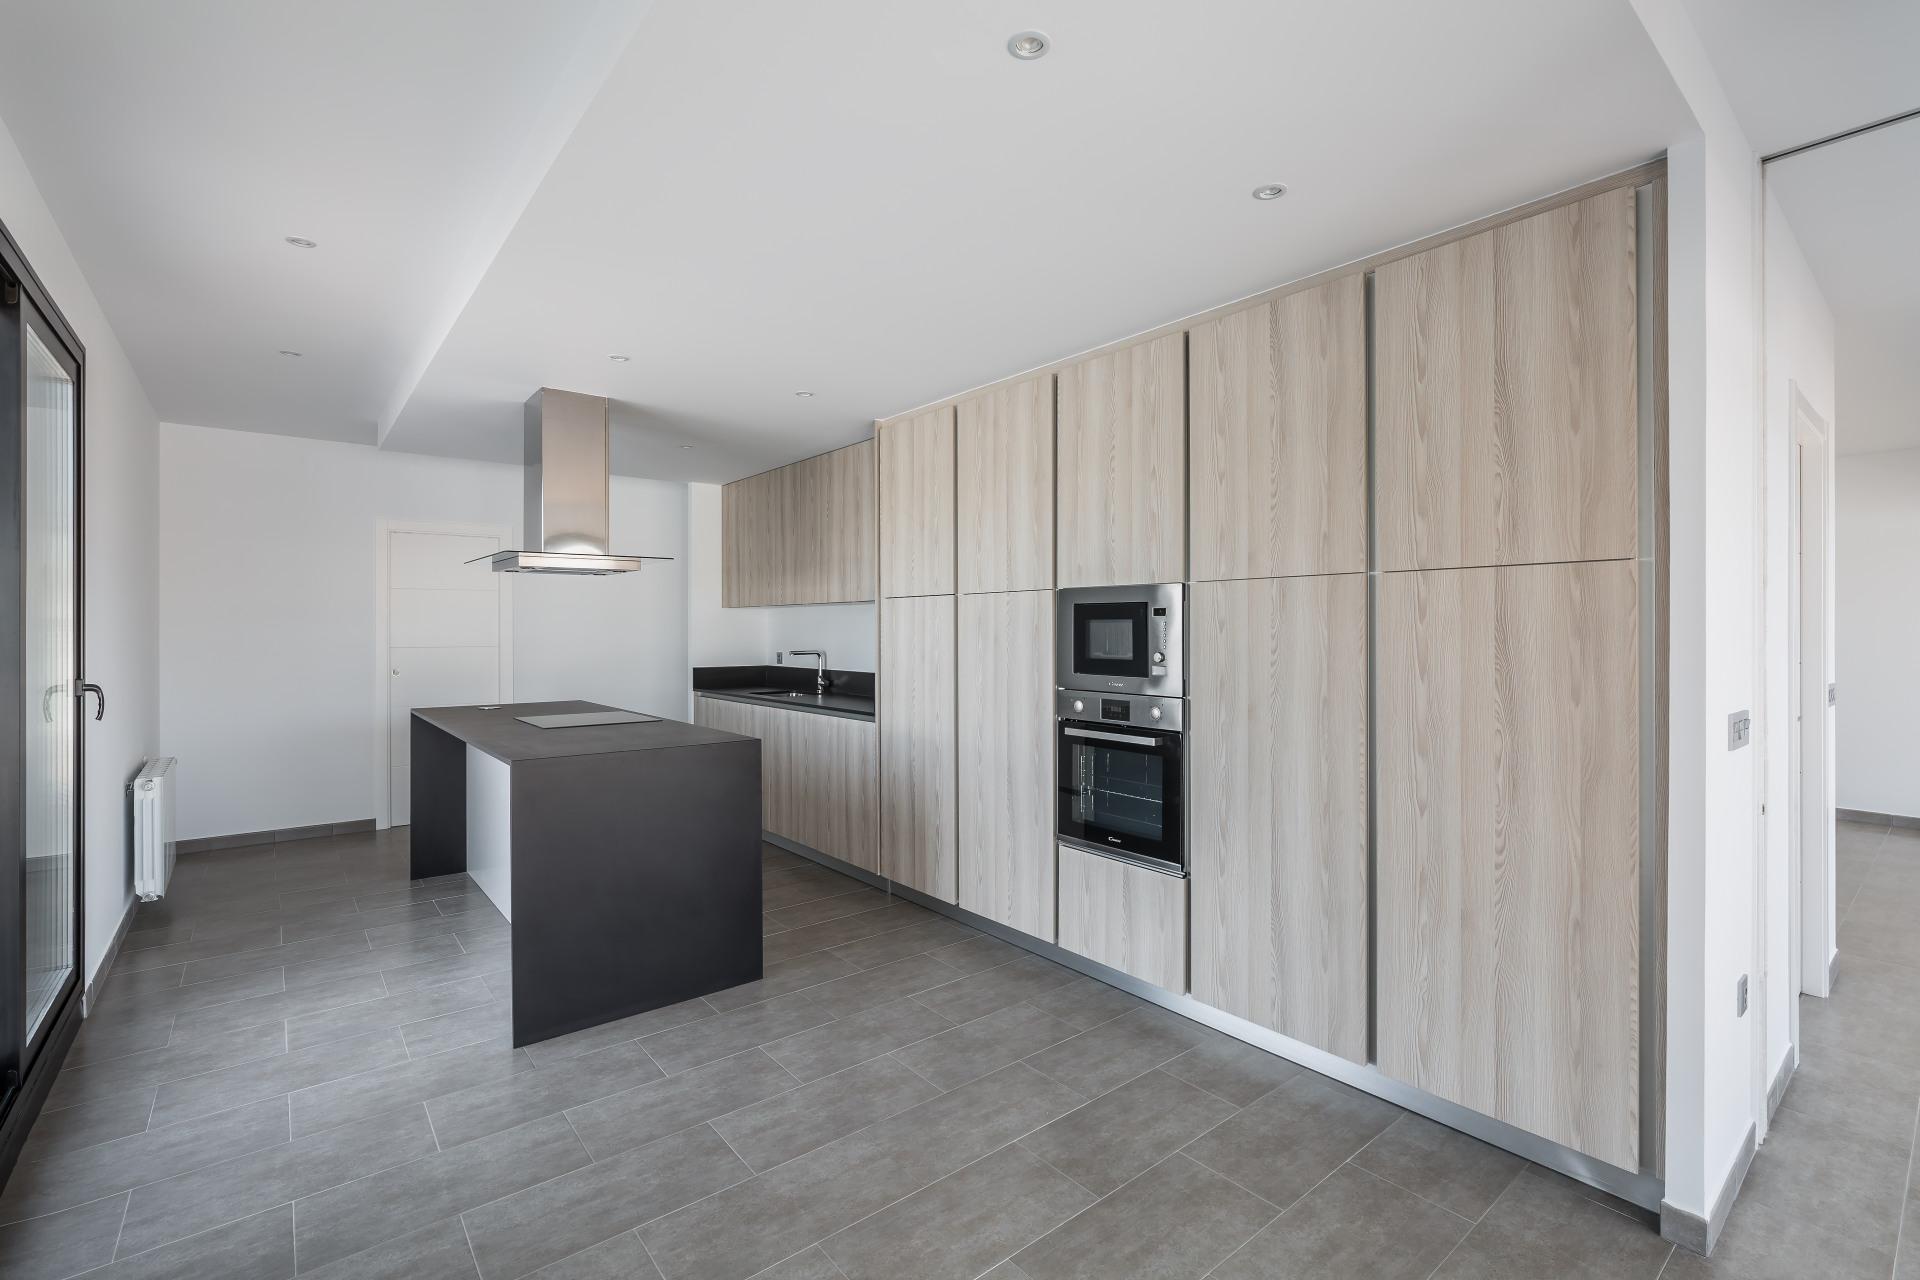 fotografia-arquitectura-valencia-german-cabo-viraje-vivienda-unifamiliar-calpe (30)